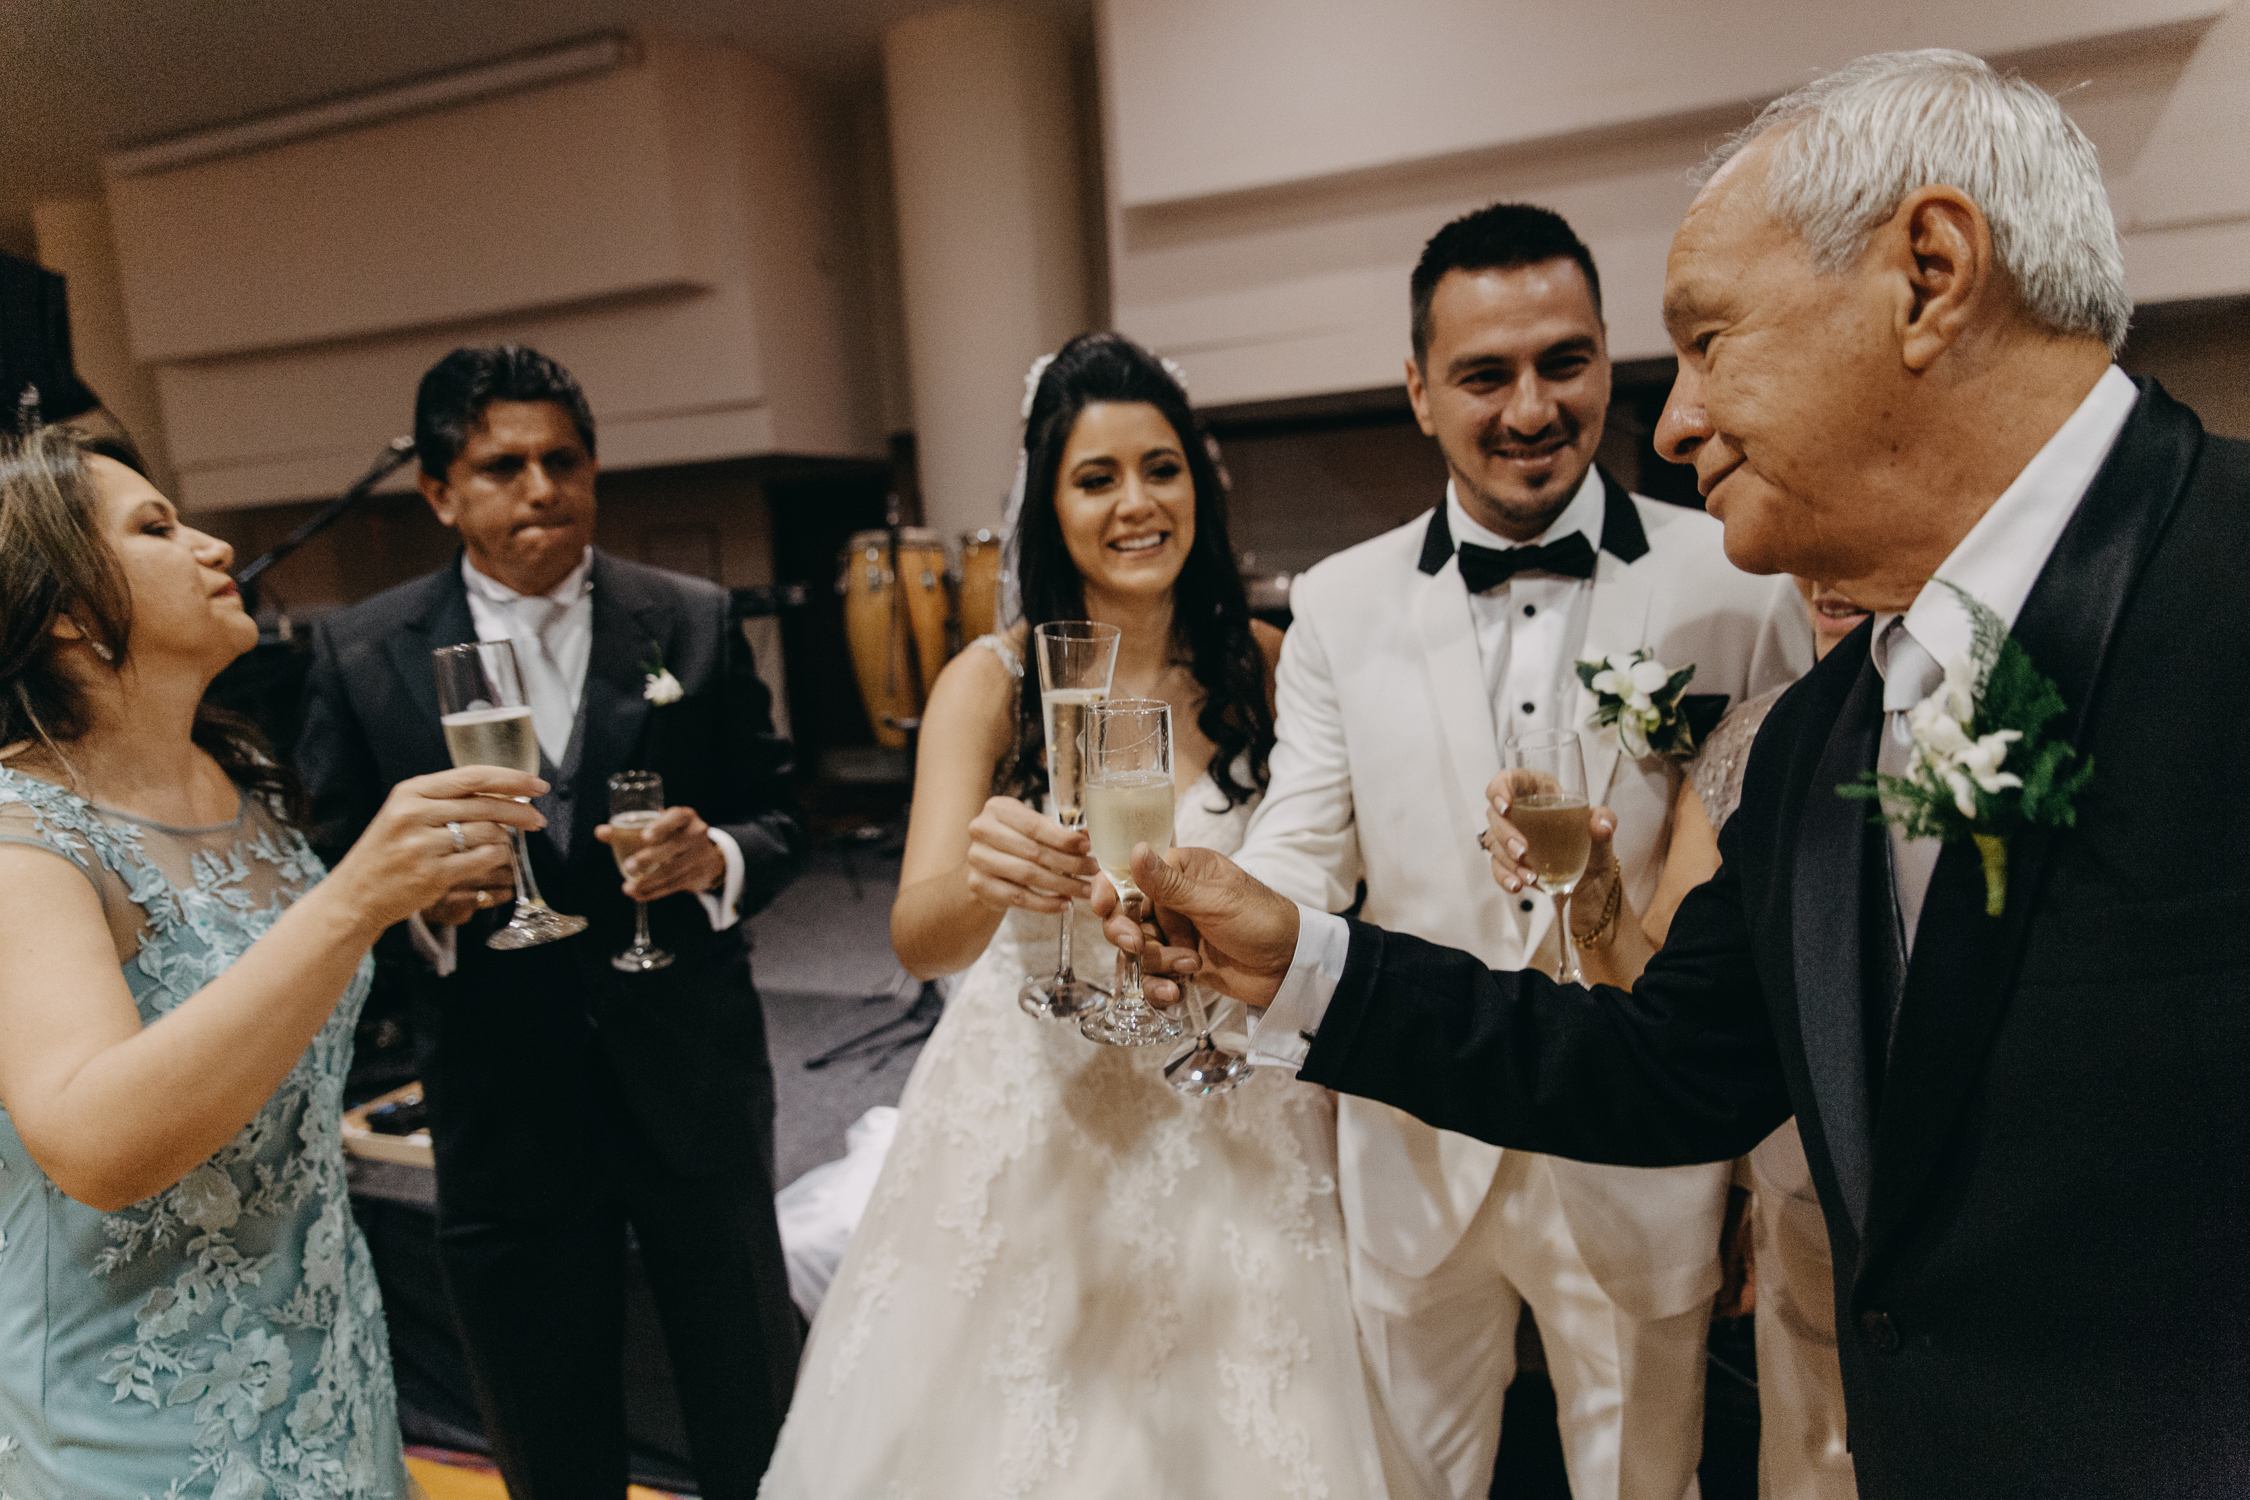 Michelle-Agurto-Fotografia-Bodas-Ecuador-Destination-Wedding-Photographer-Daniela-Dirk-47.JPG